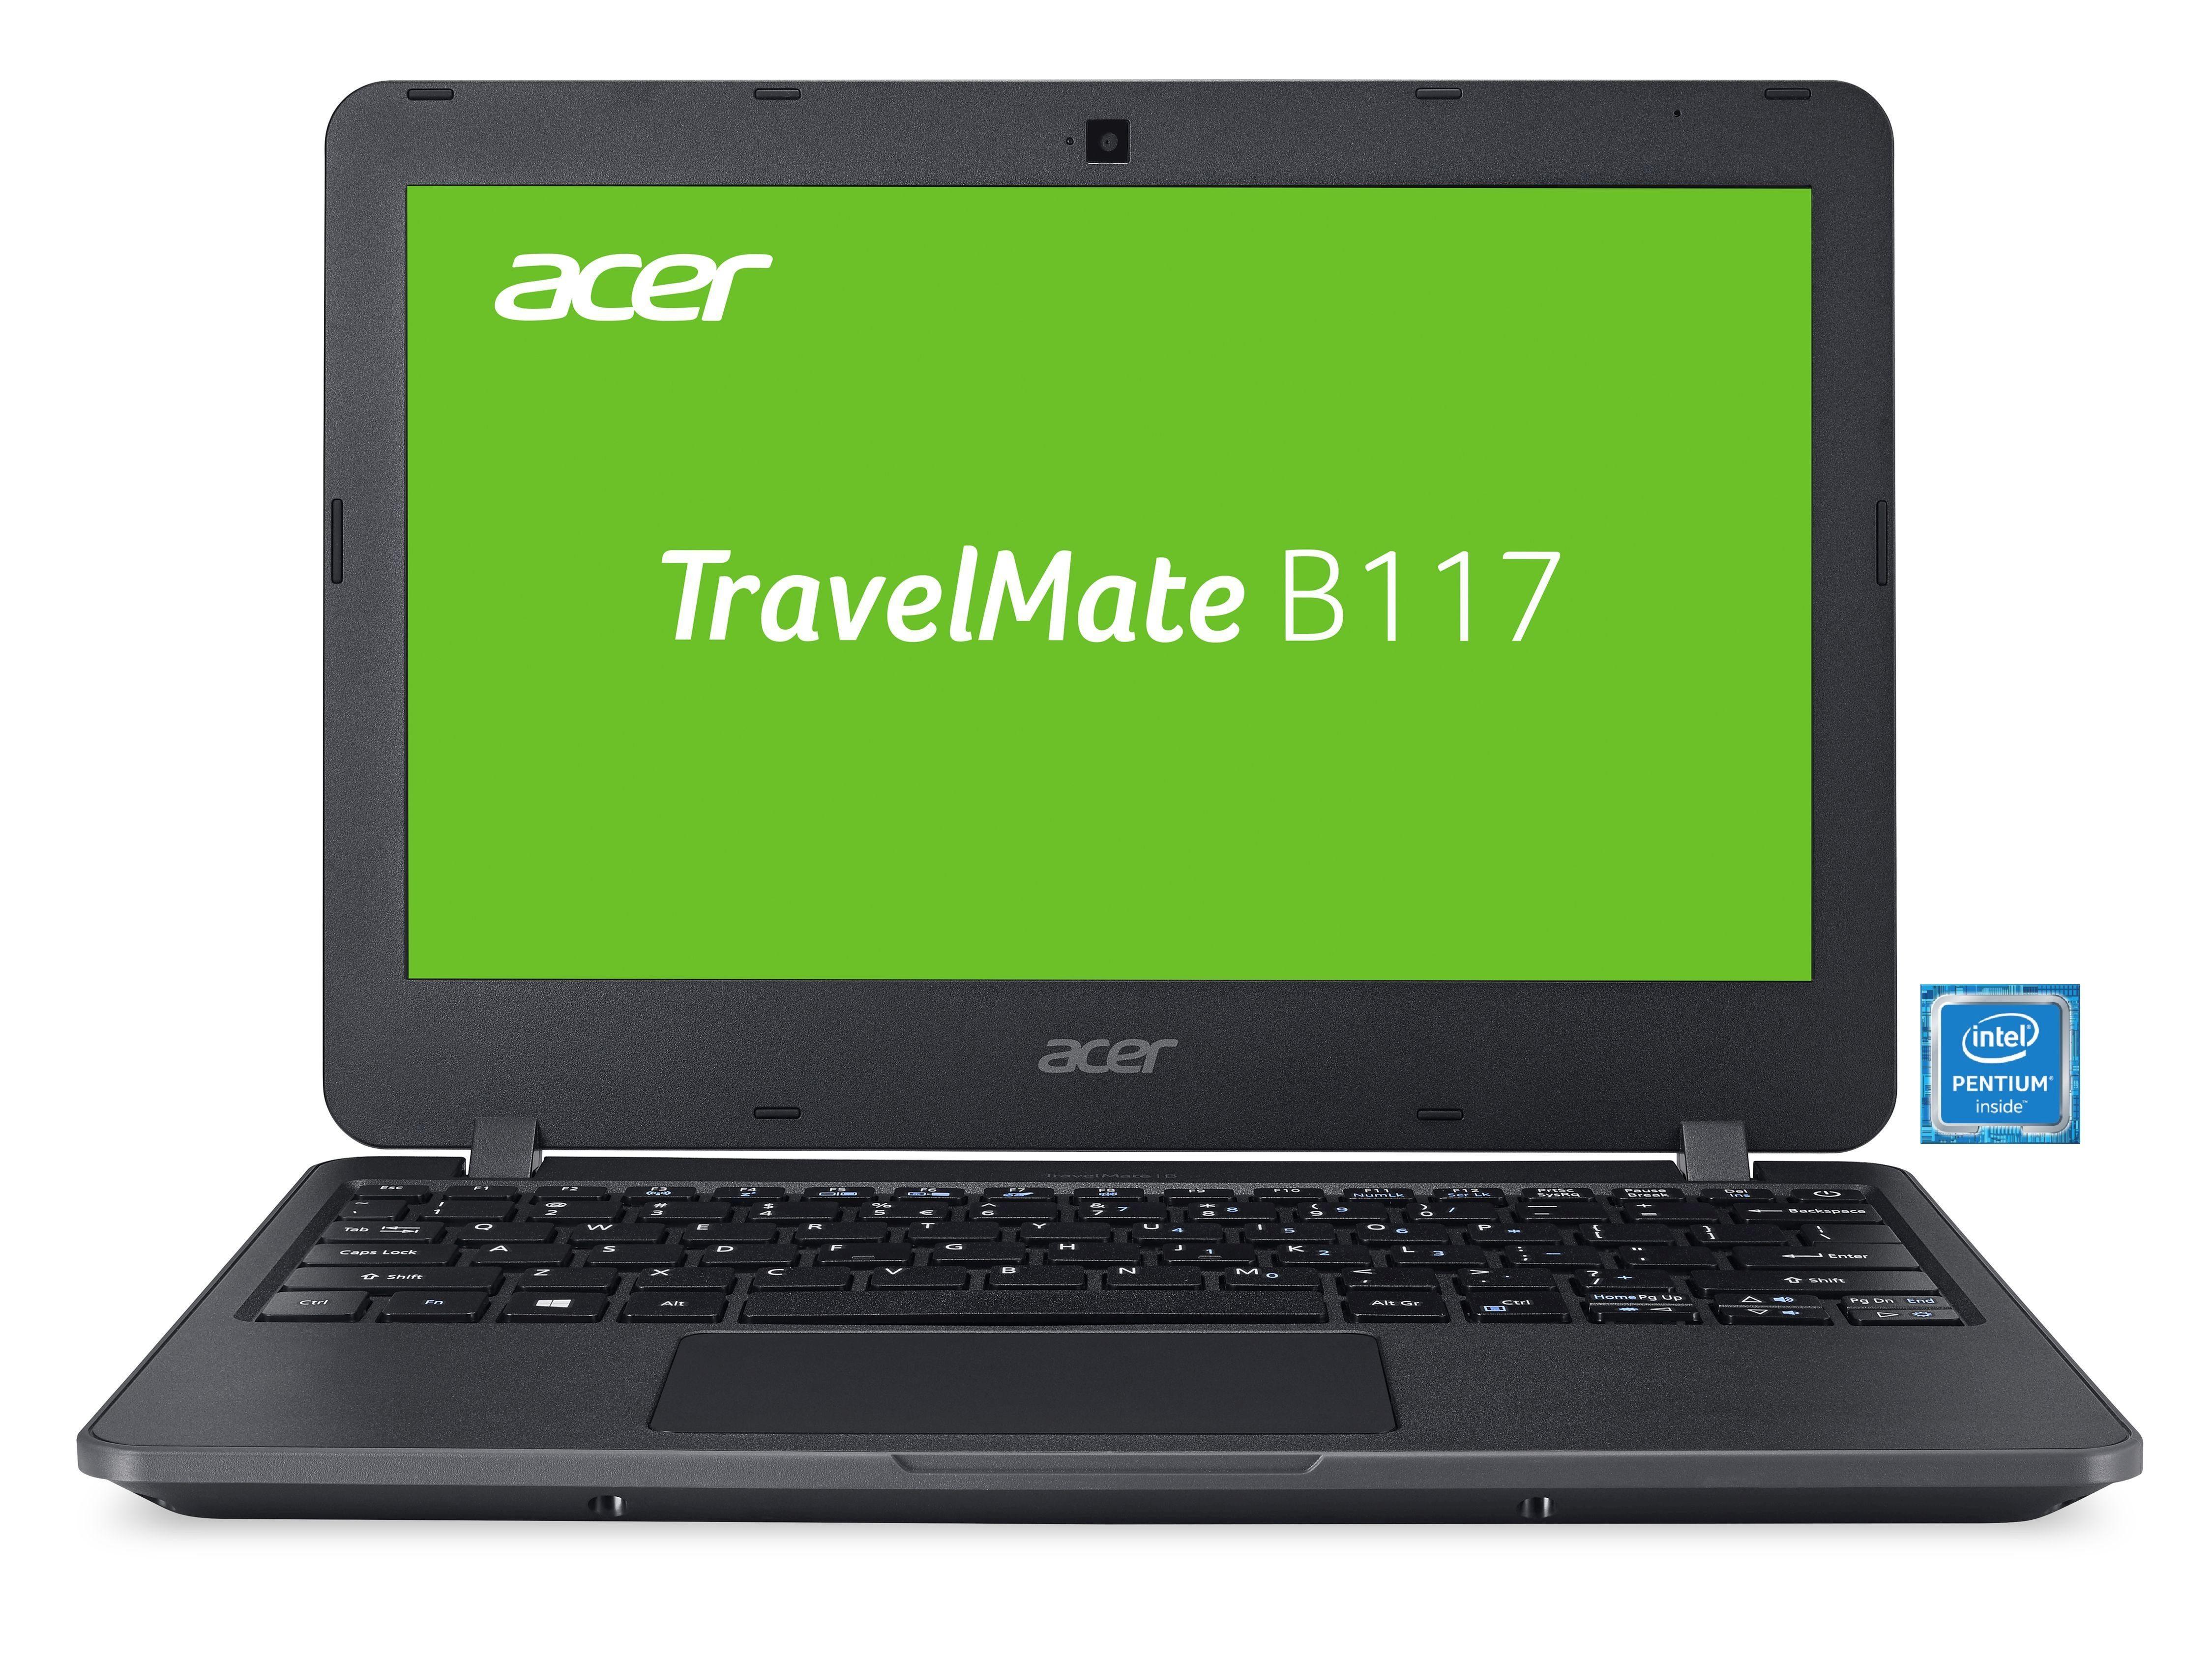 "ACER TravelMate B117 Notebook »Intel Pentium, 29,46cm (11,6""), 128 GB SSD, 4 GB«"